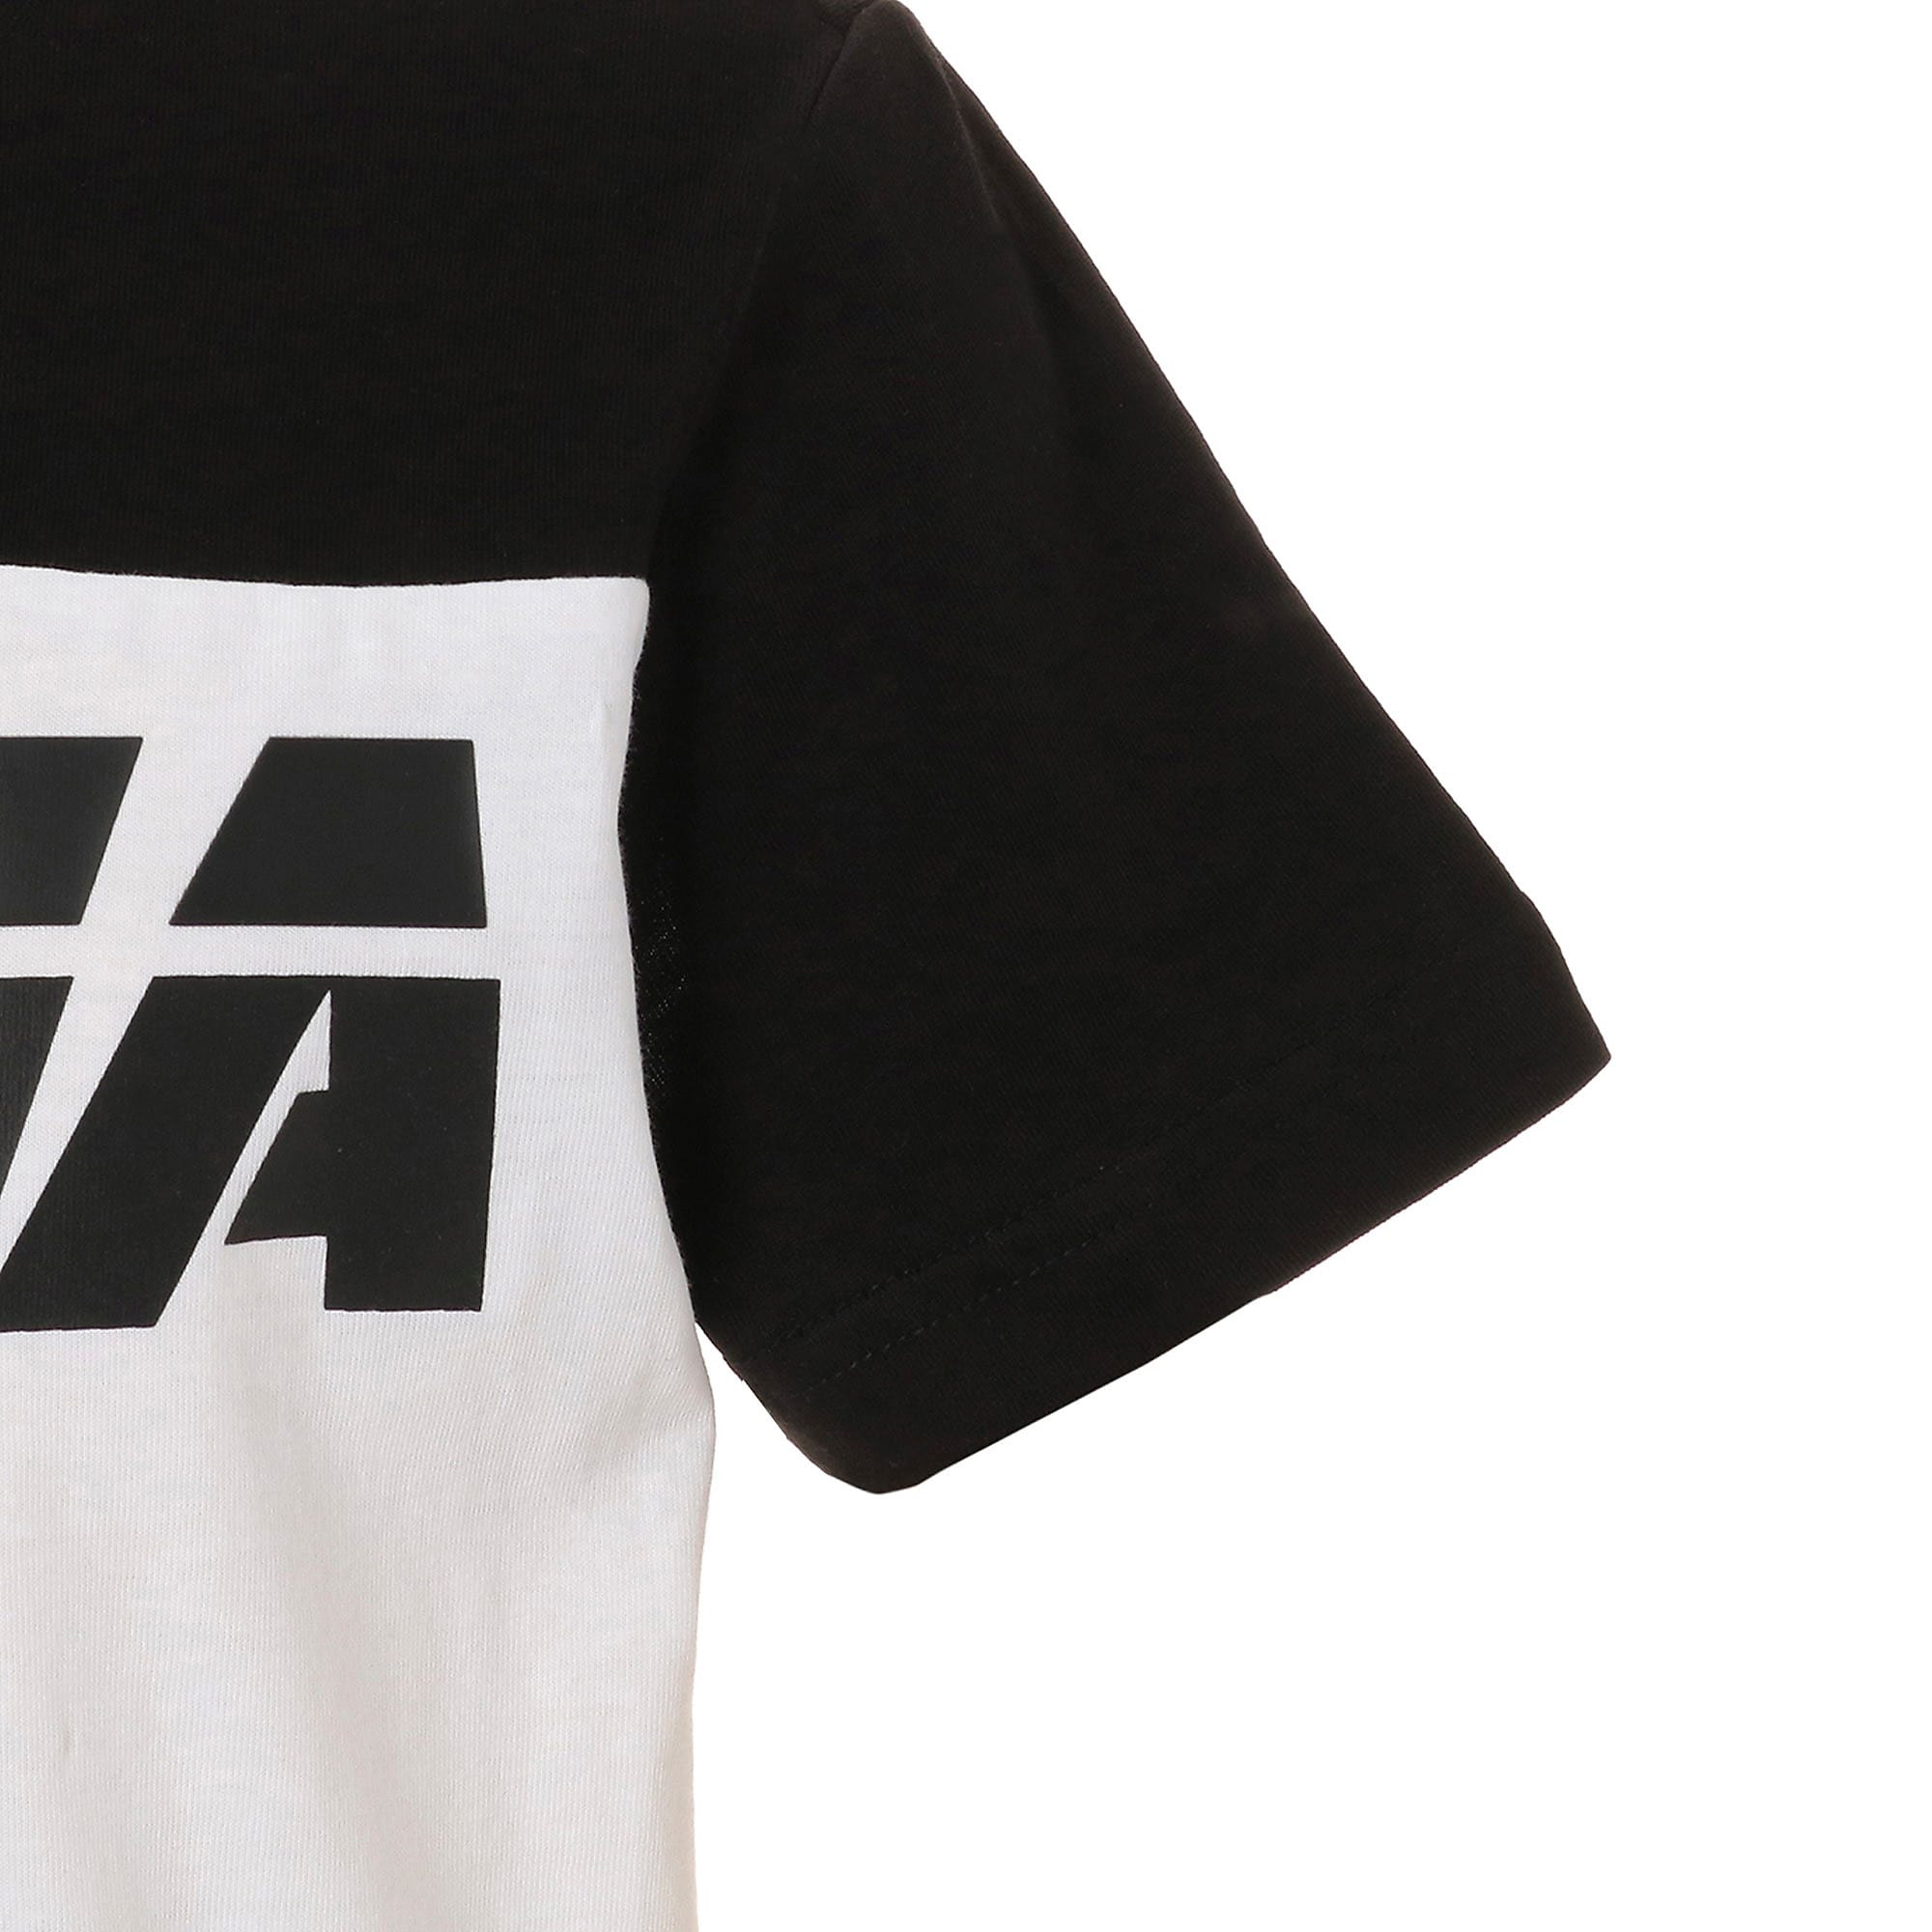 Thumbnail 5 of キッズ ALPHA SS トレンド Tシャツ 半袖, Puma Black, medium-JPN